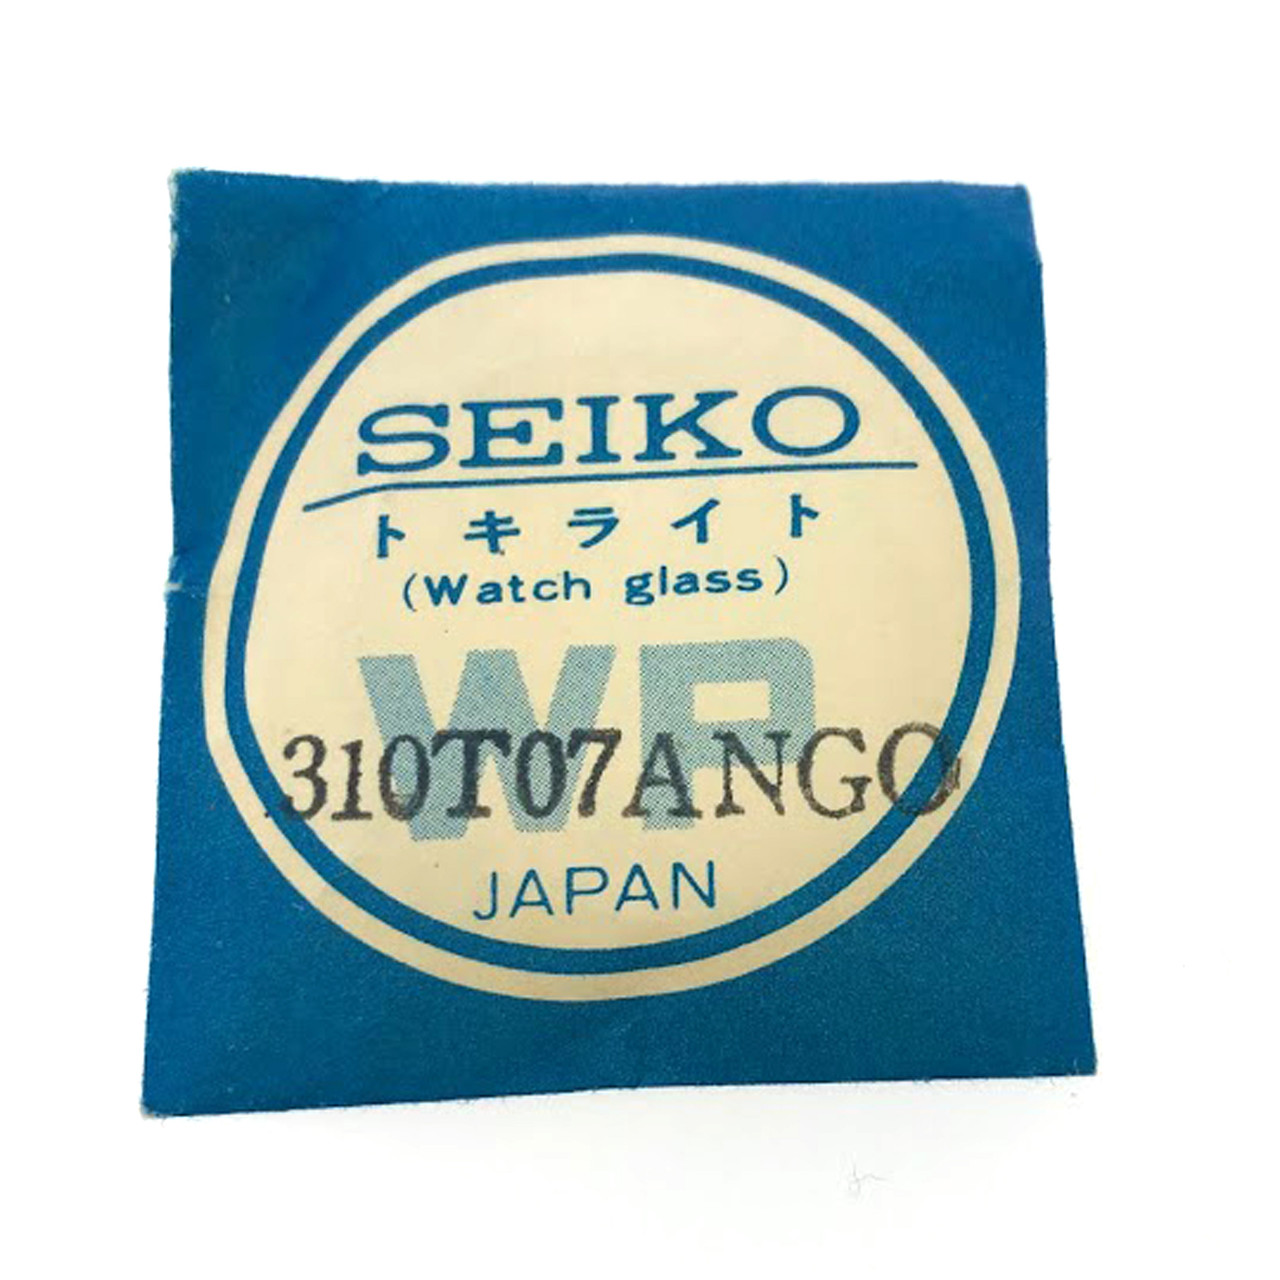 Seiko 310T07ANG crystal